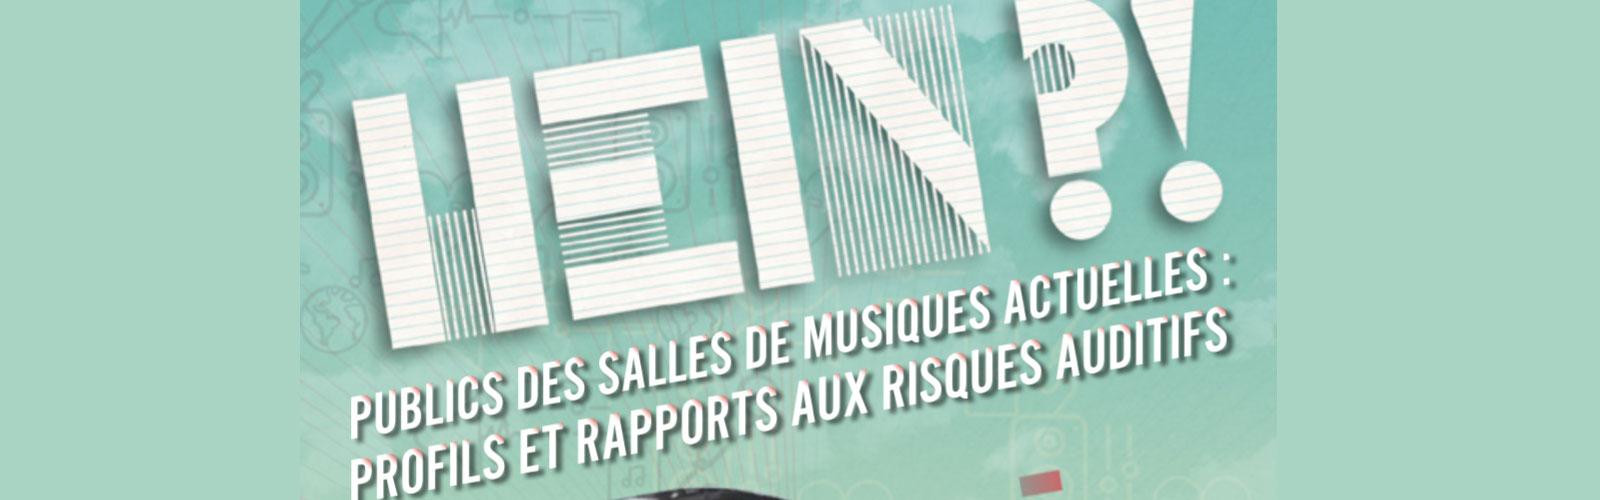 hein-rapport-publics